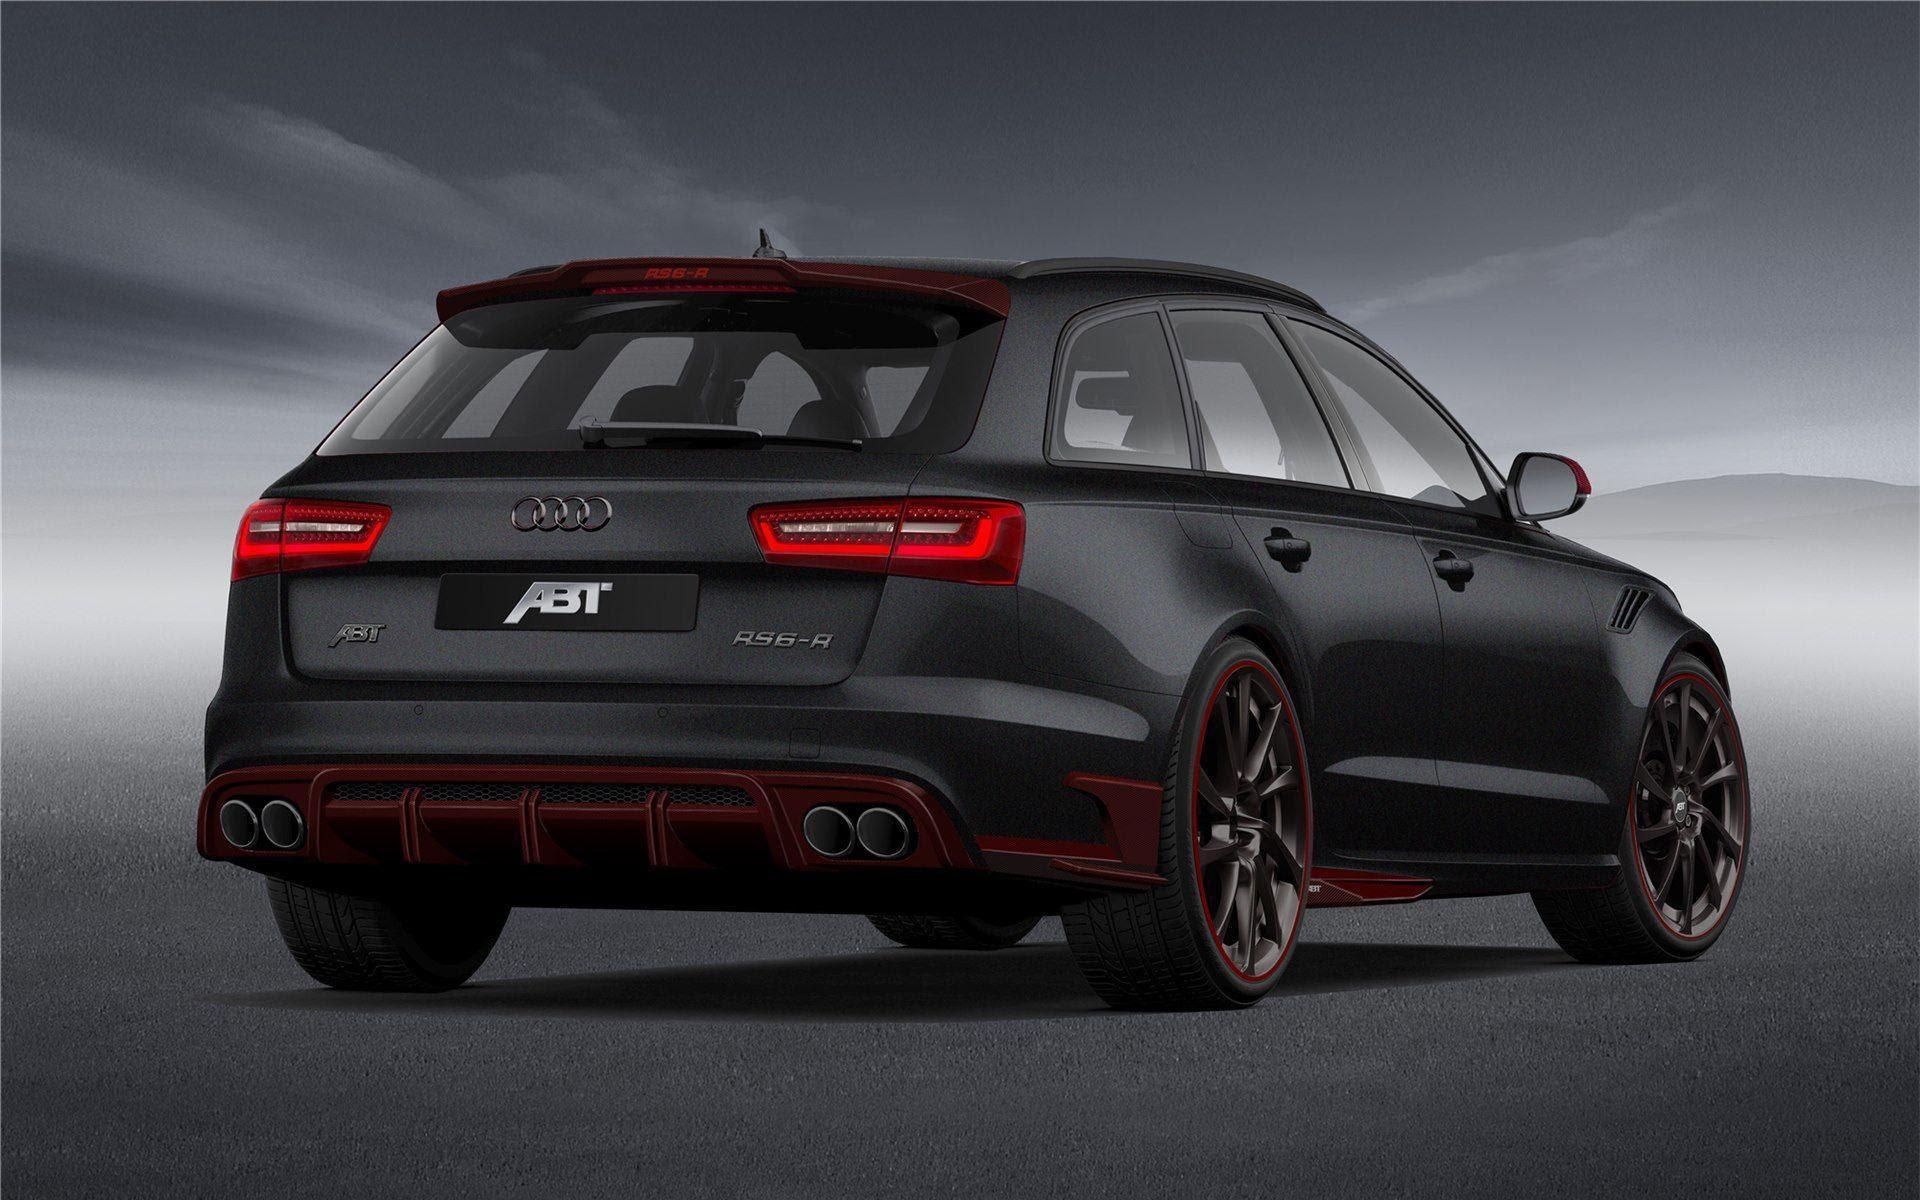 Audi RS6 Wallpapers - Wallpaper Cave